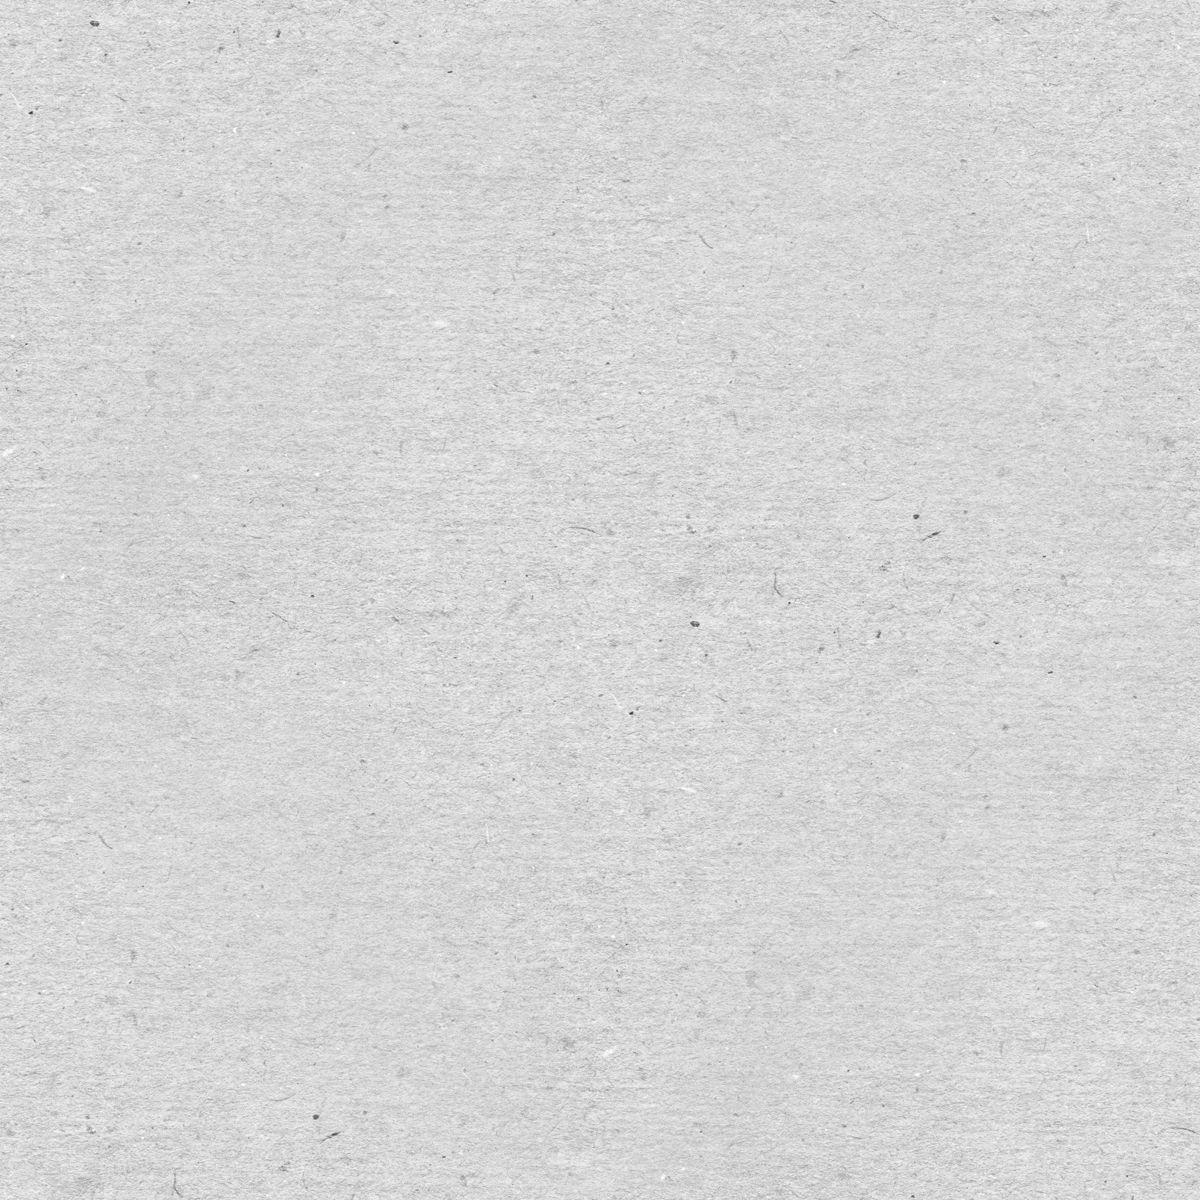 30 Free Seamless Background Textures